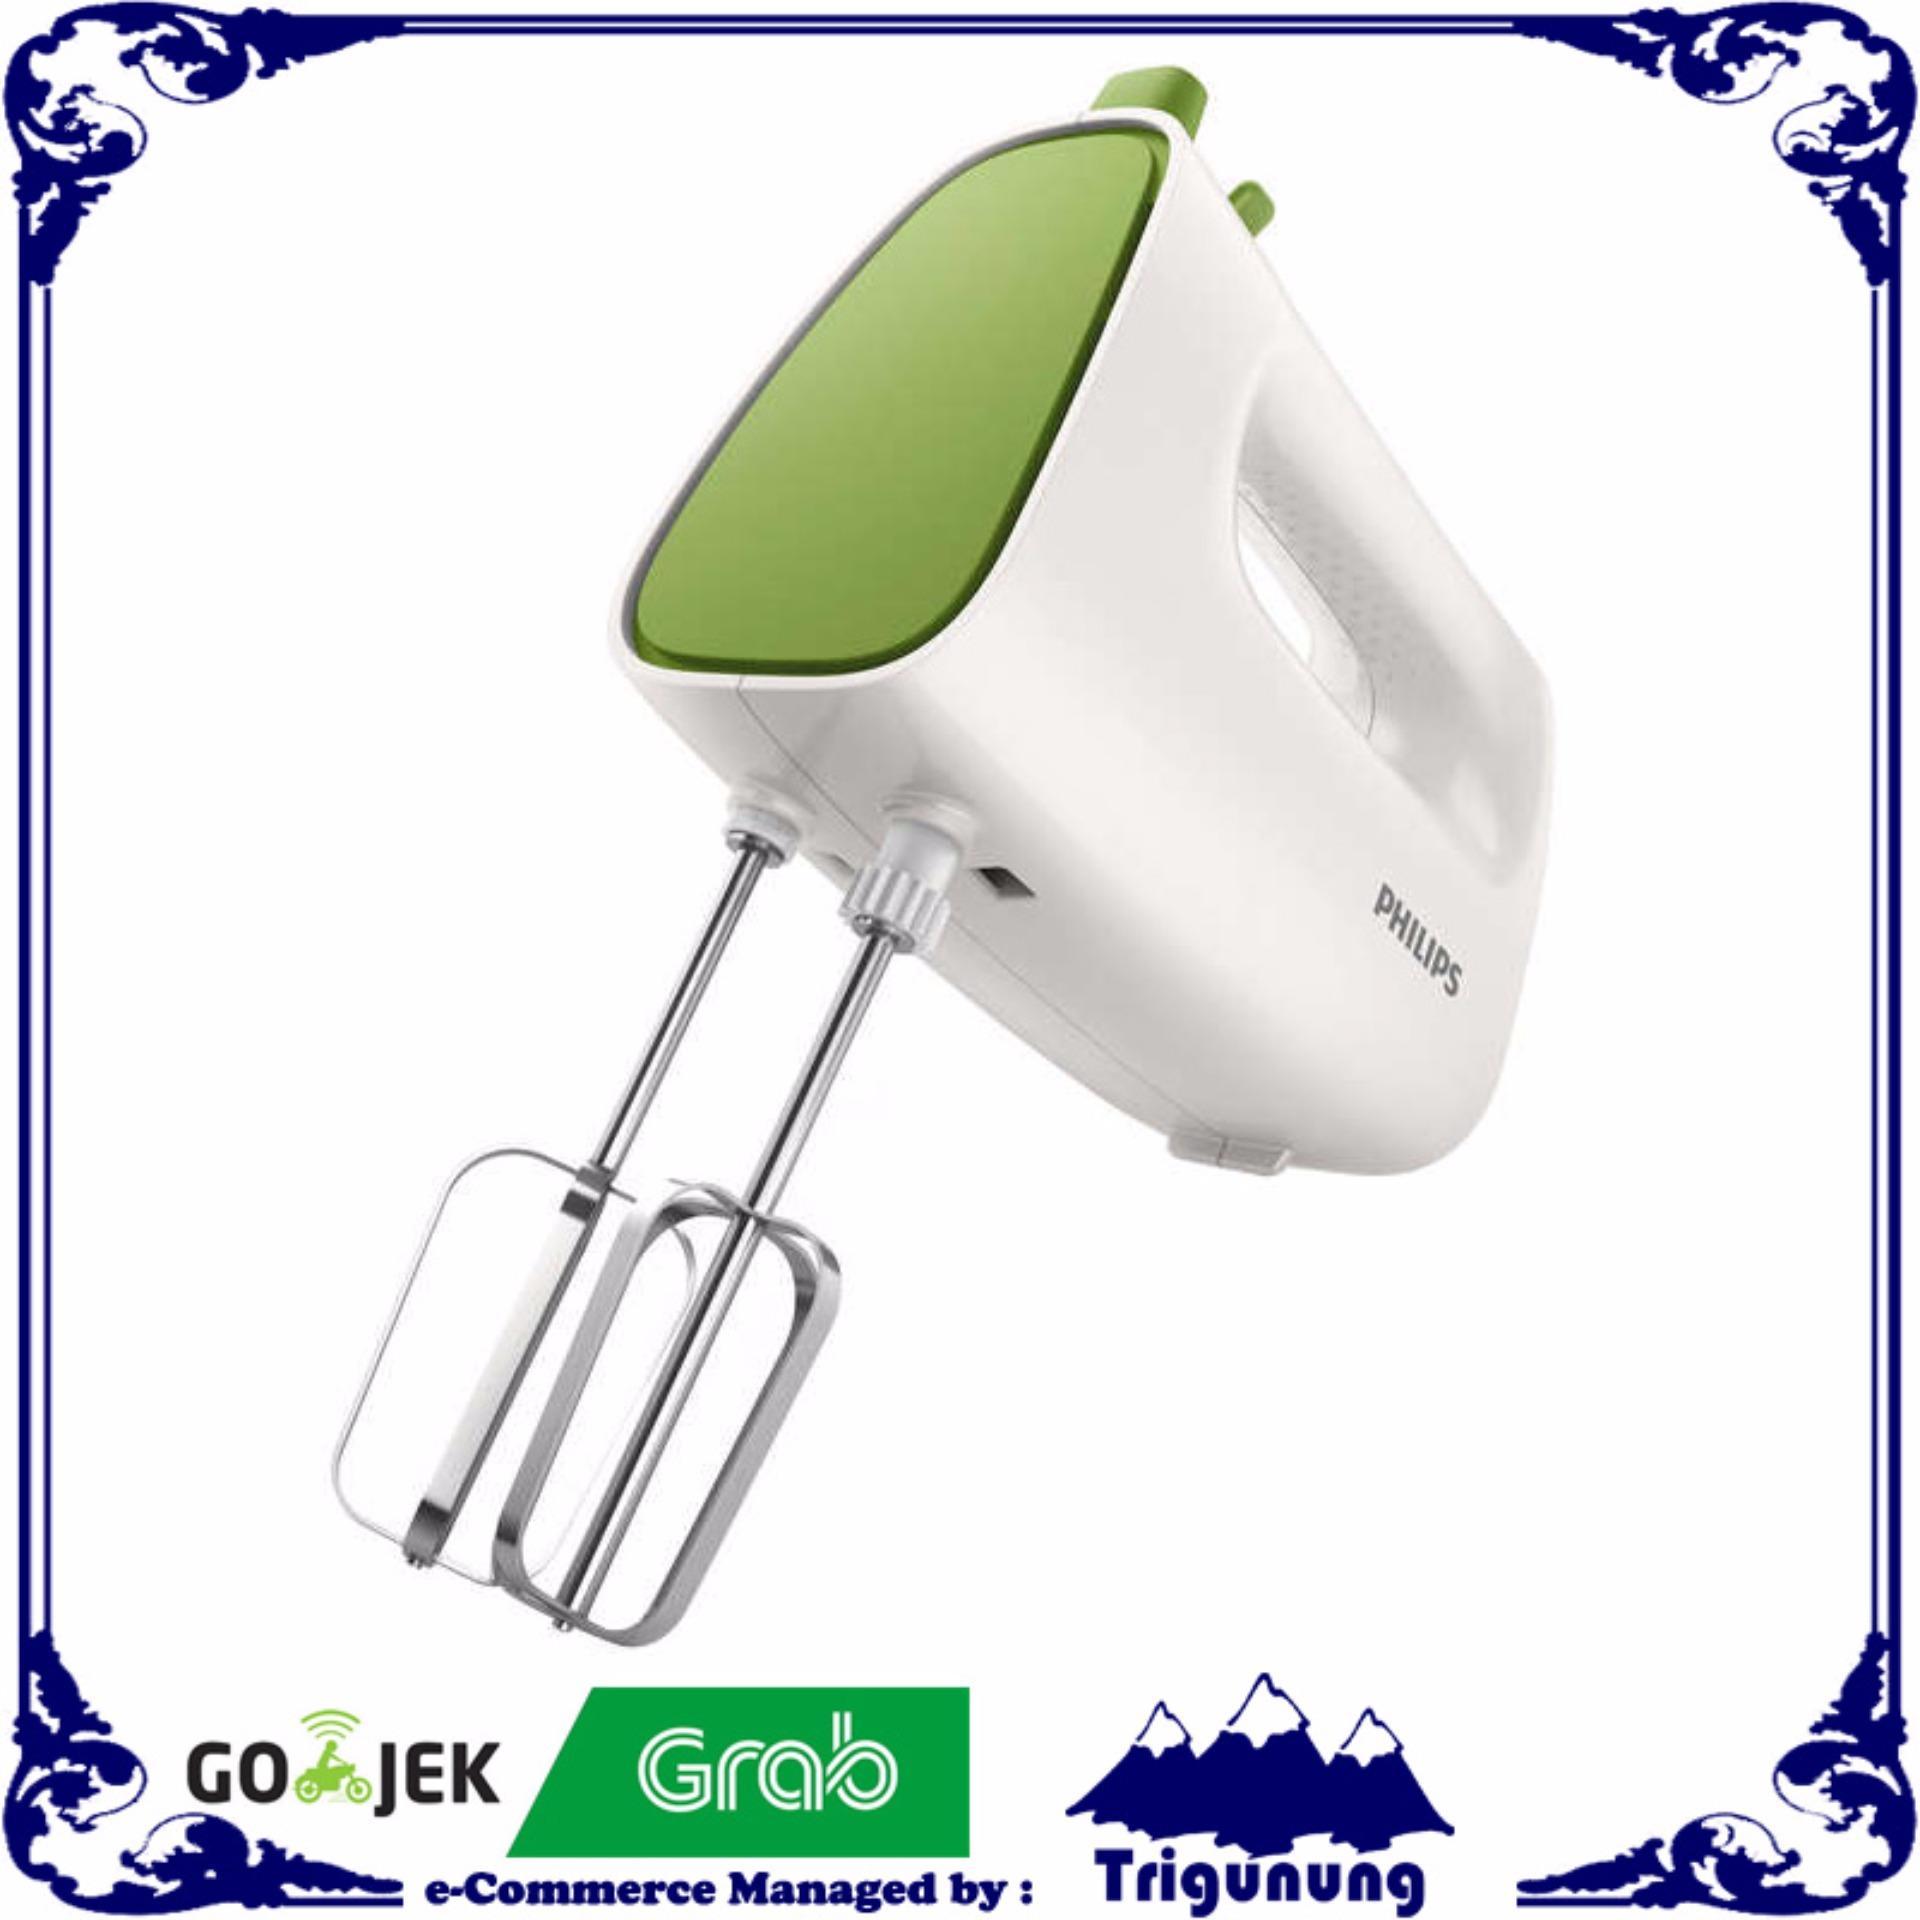 List Harga Blender Philips 5 Speed Terbaru Tabel Cari Bandingkan Lanjarjaya Hand Mixer Mini Milk Frother